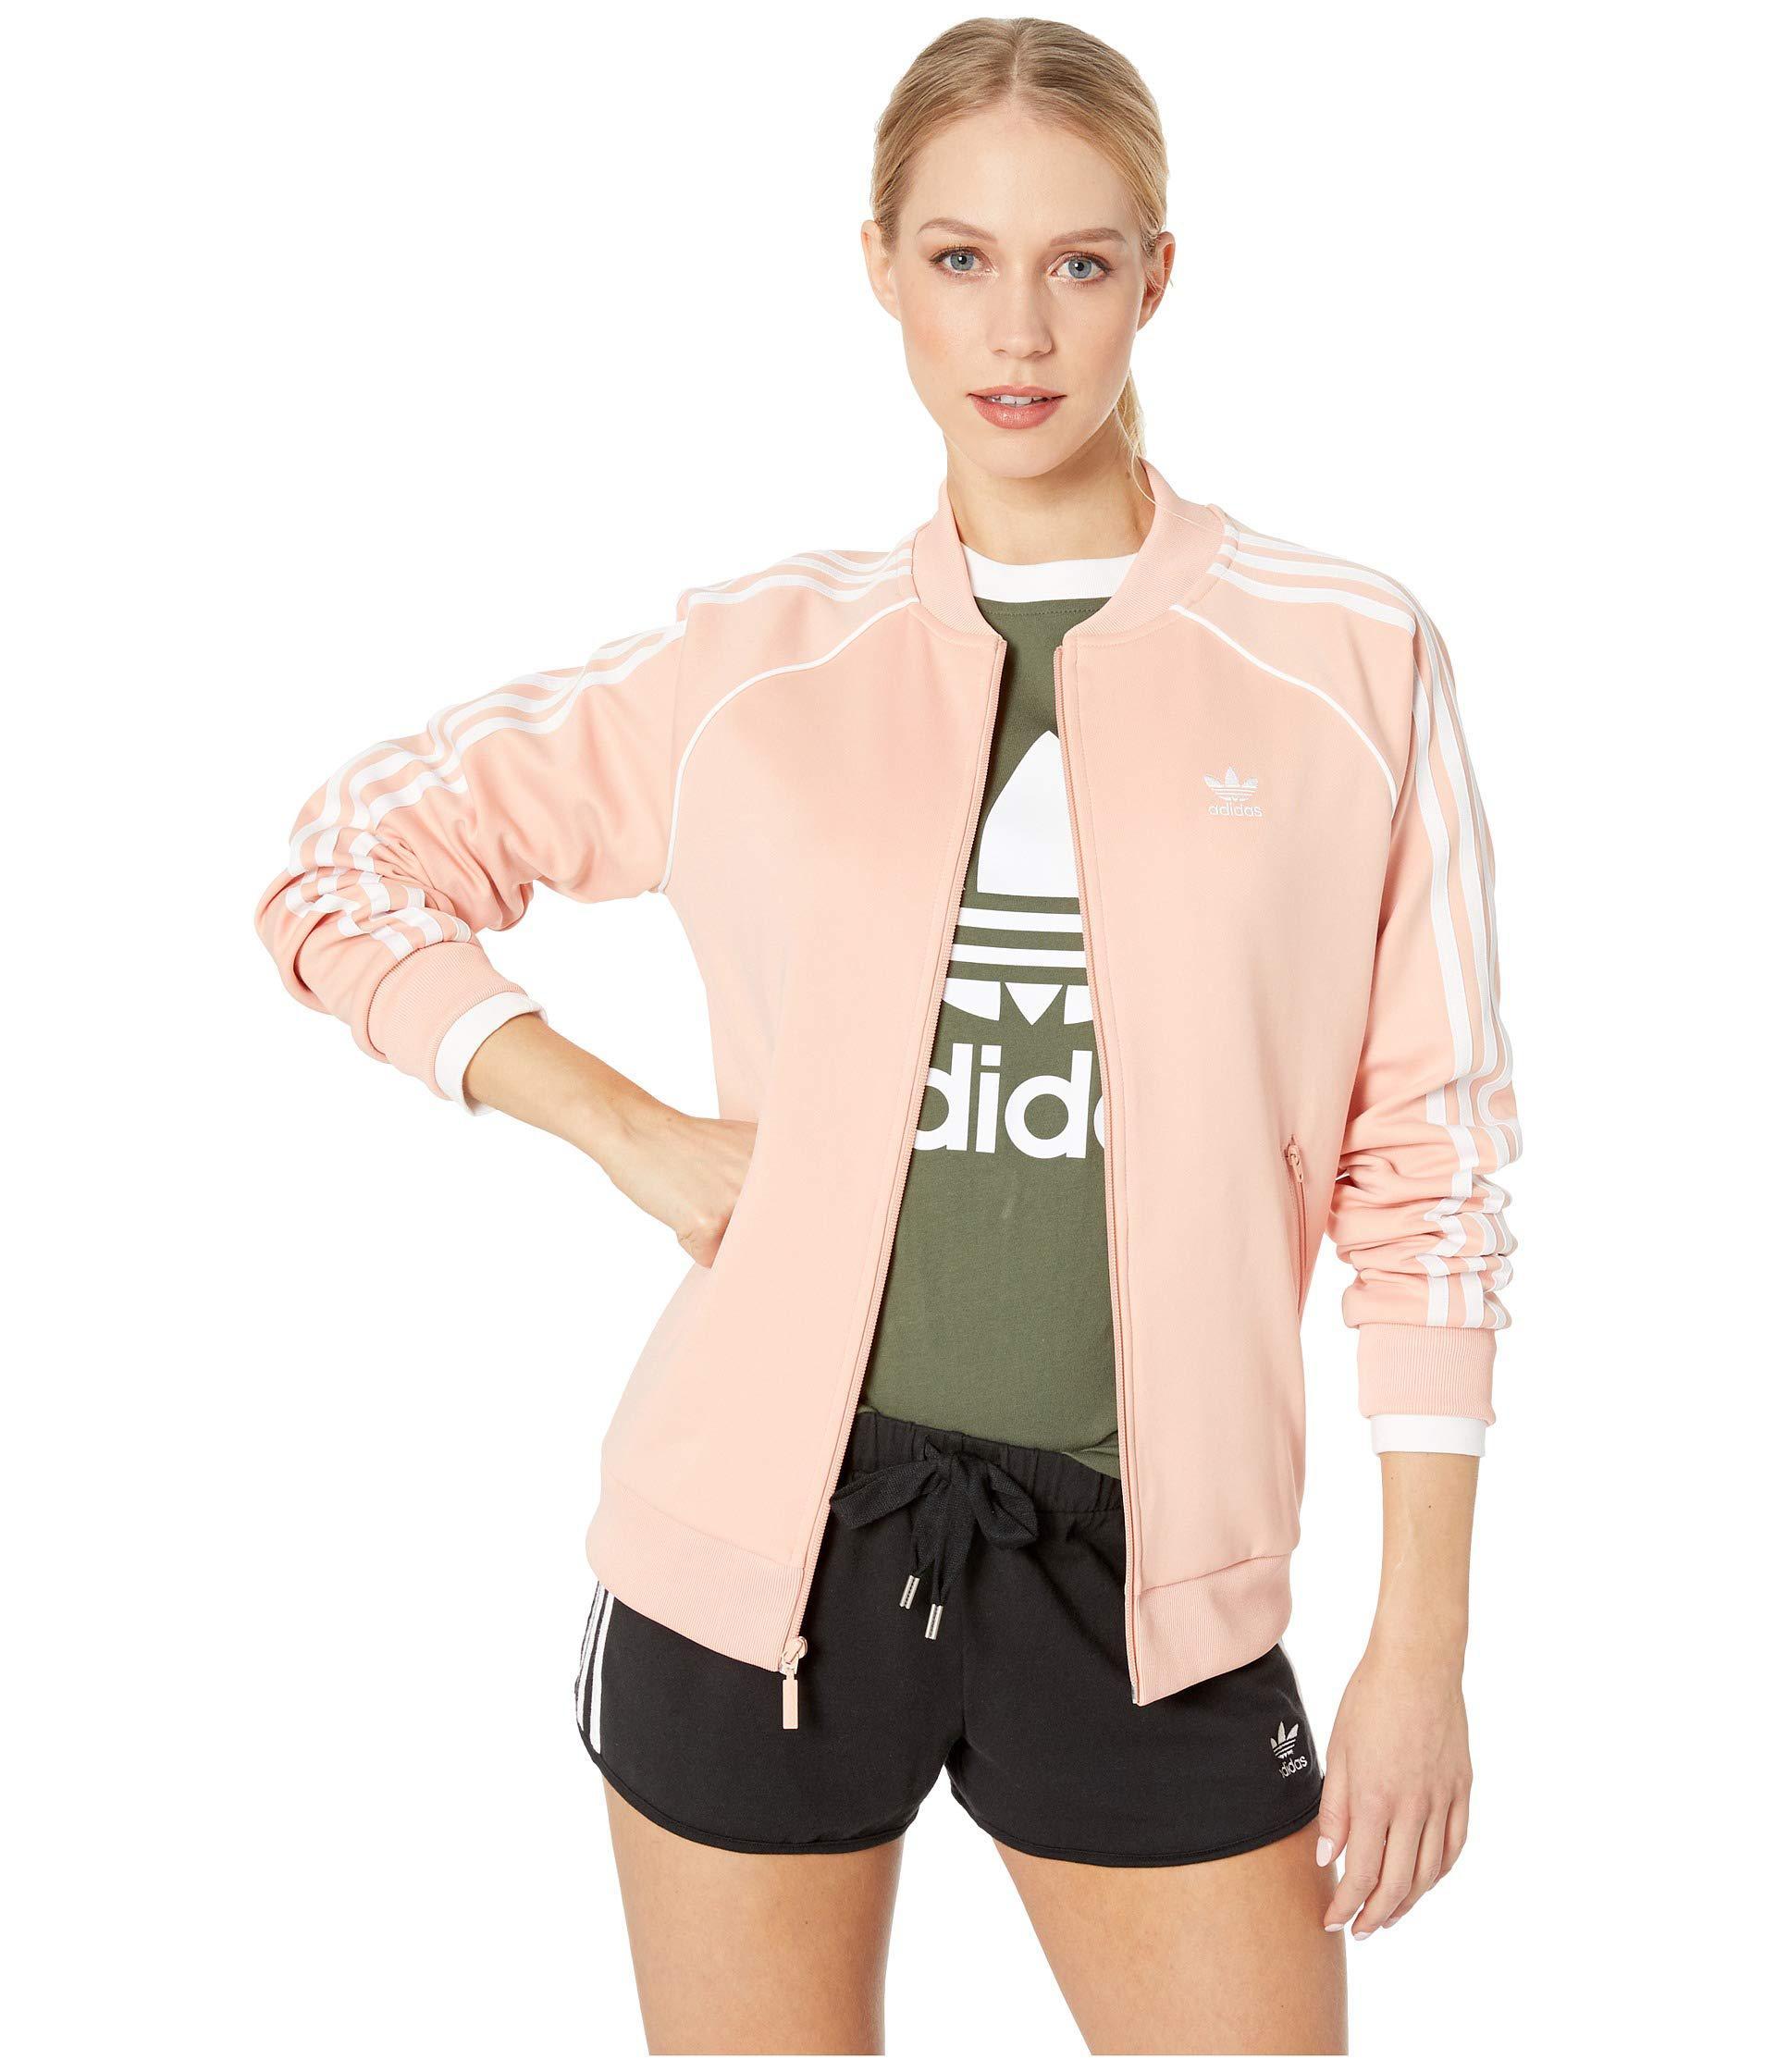 Lyst - Adidas Originals Sst Track Jacket (collegiate Navy) Women s ... f1287f9e78